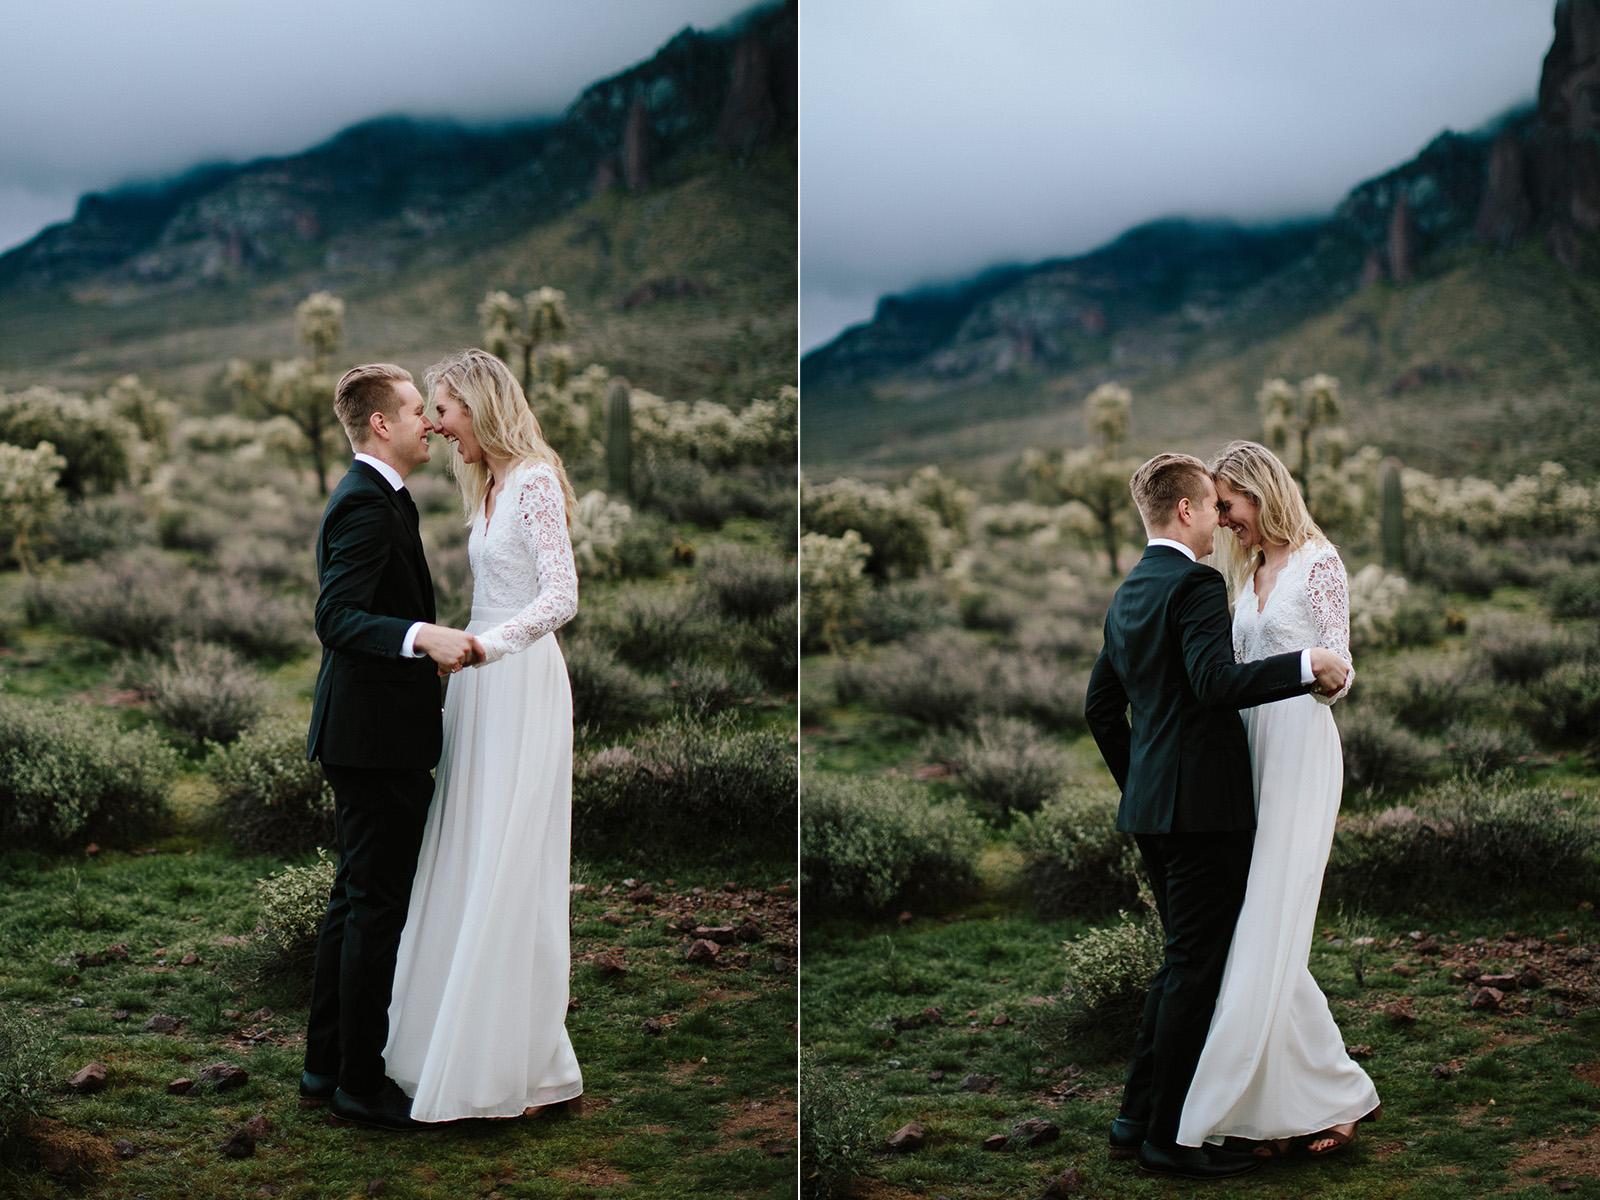 phoenix-mesa-elopement-wedding-photographer-lost-dutchman-state-park-superstitious-mountains-41.jpg